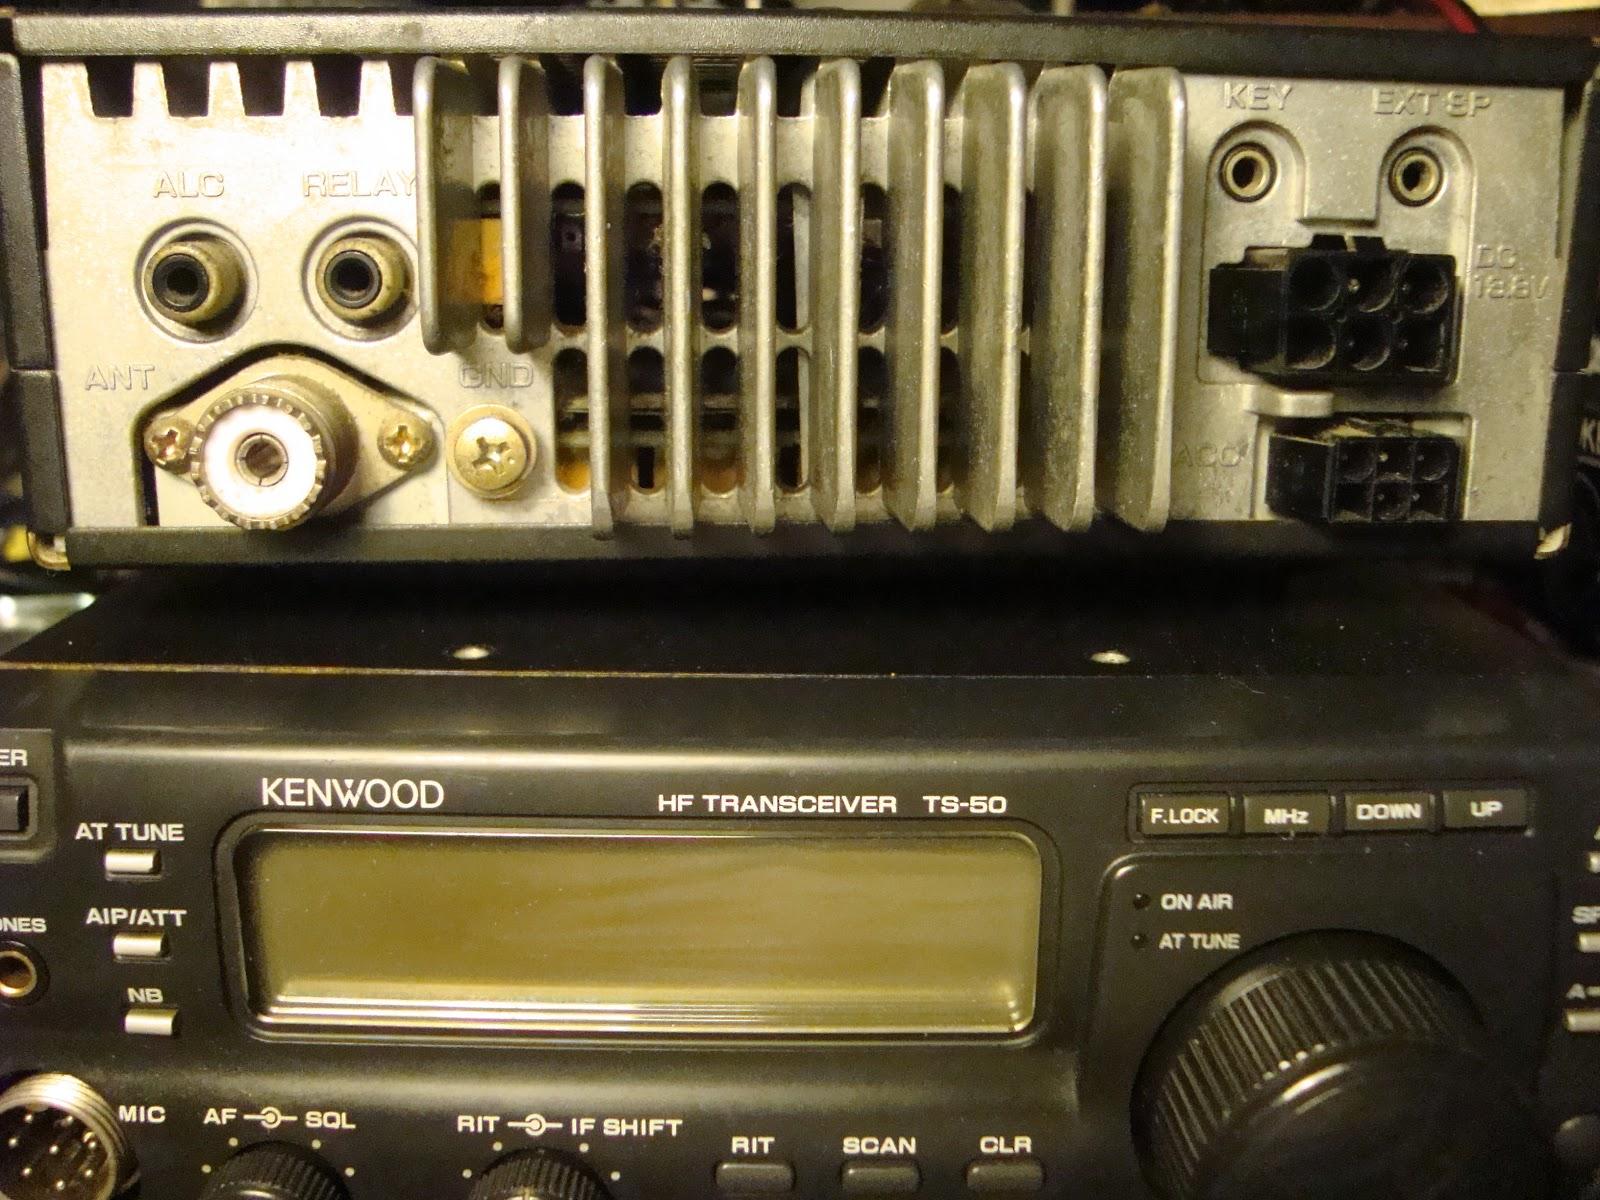 radio seller kenwood ts 50 for mobile sold rh tono radioseller blogspot com kenwood ts-50 manual service kenwood ts-50 user manual